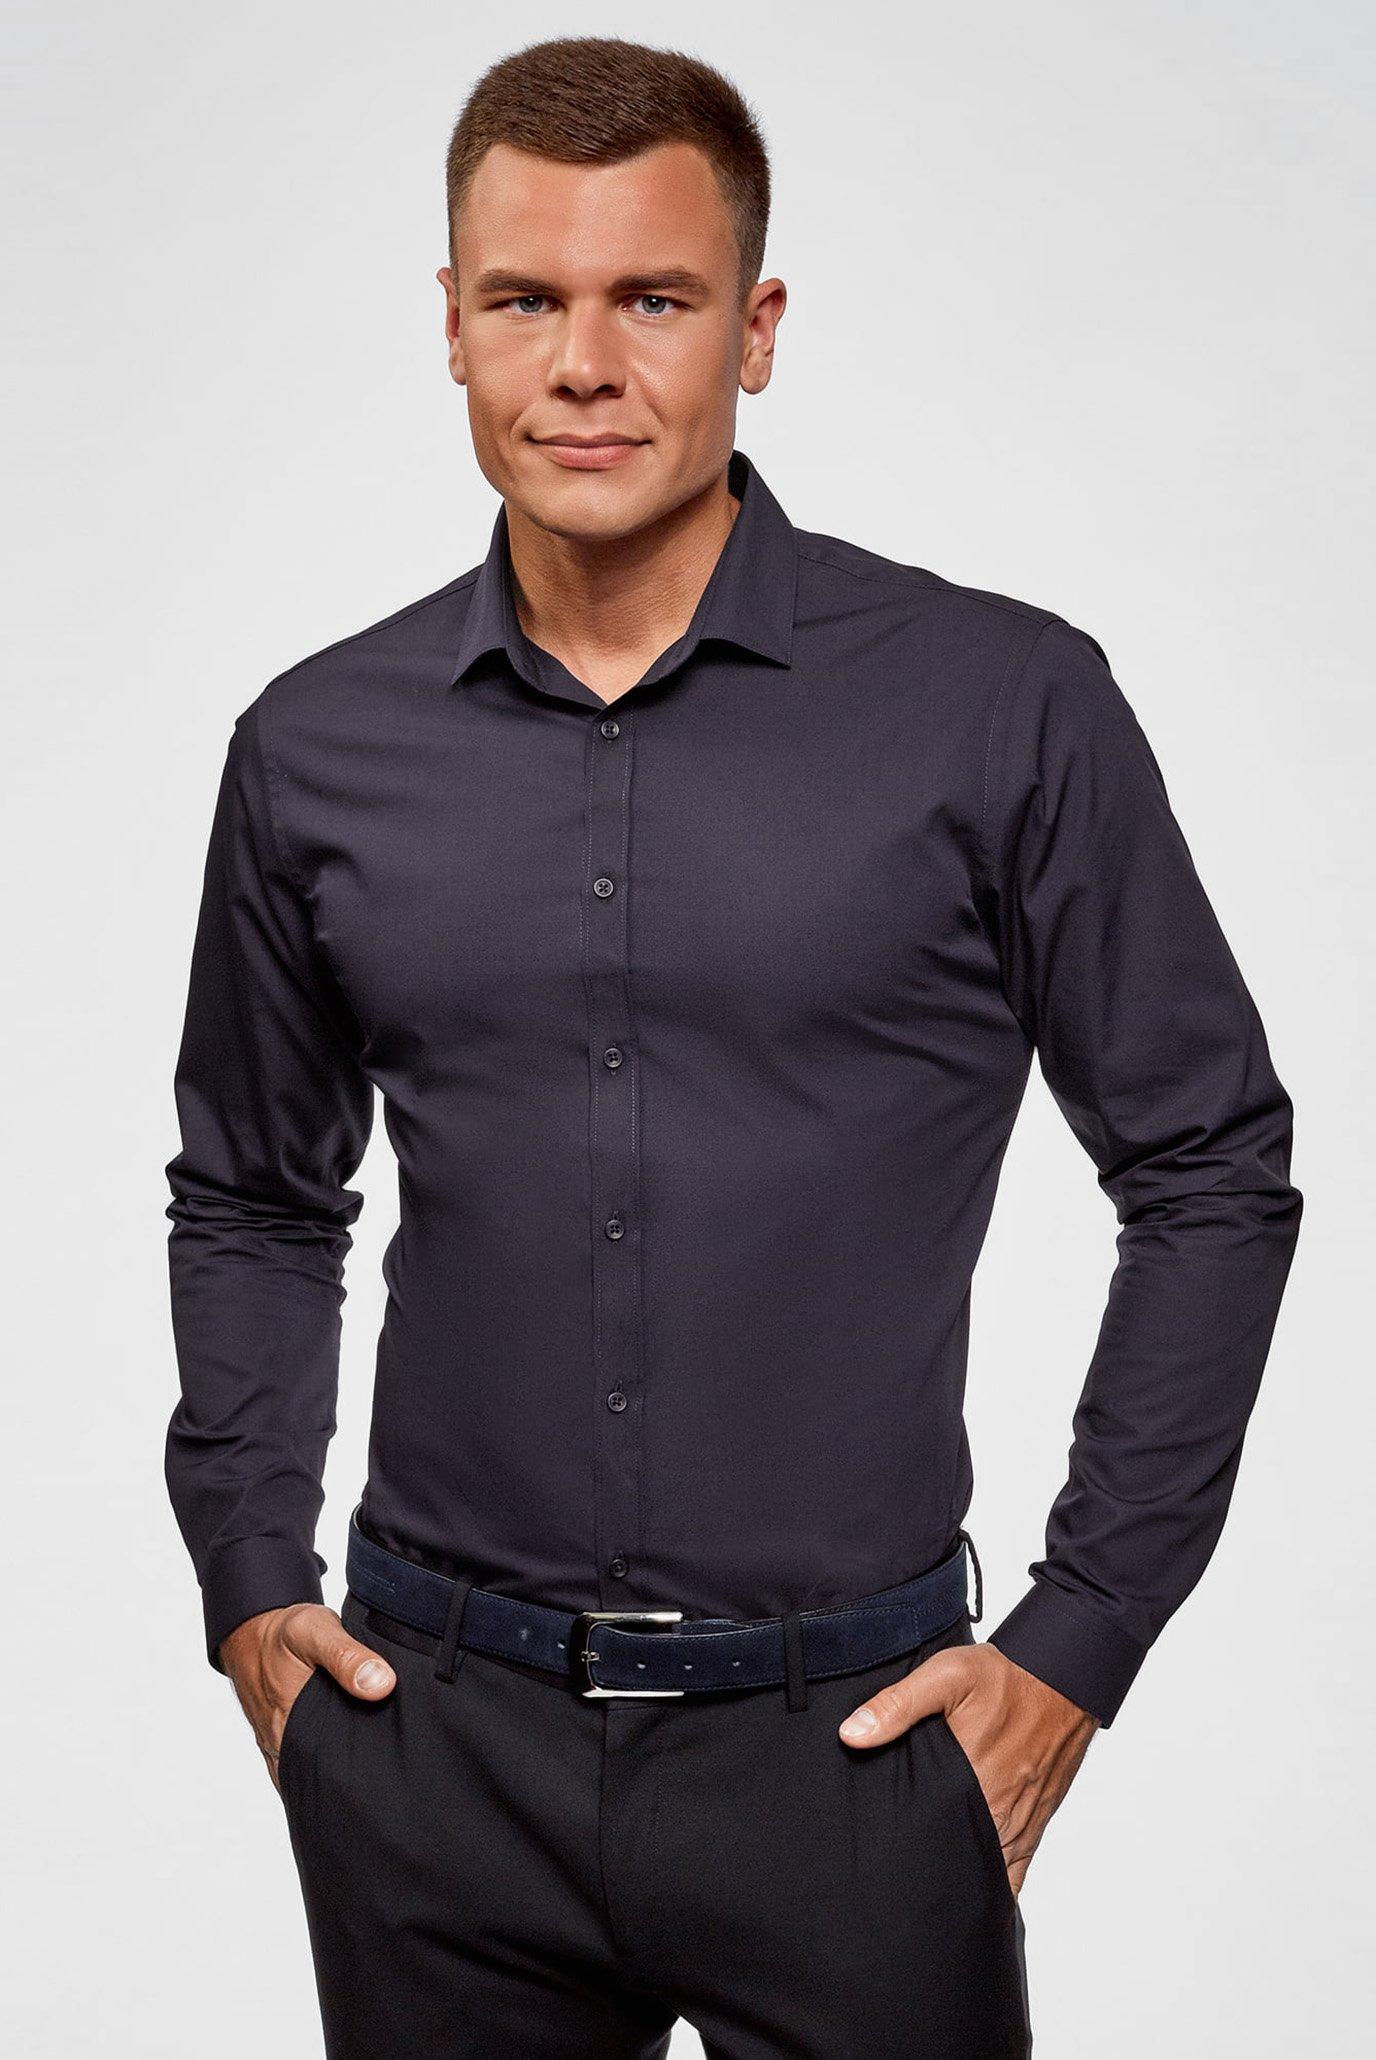 749d7d231a2 Купить Мужская темно-синяя рубашка Oodji Oodji 3B110012M 23286N 7902N –  Киев